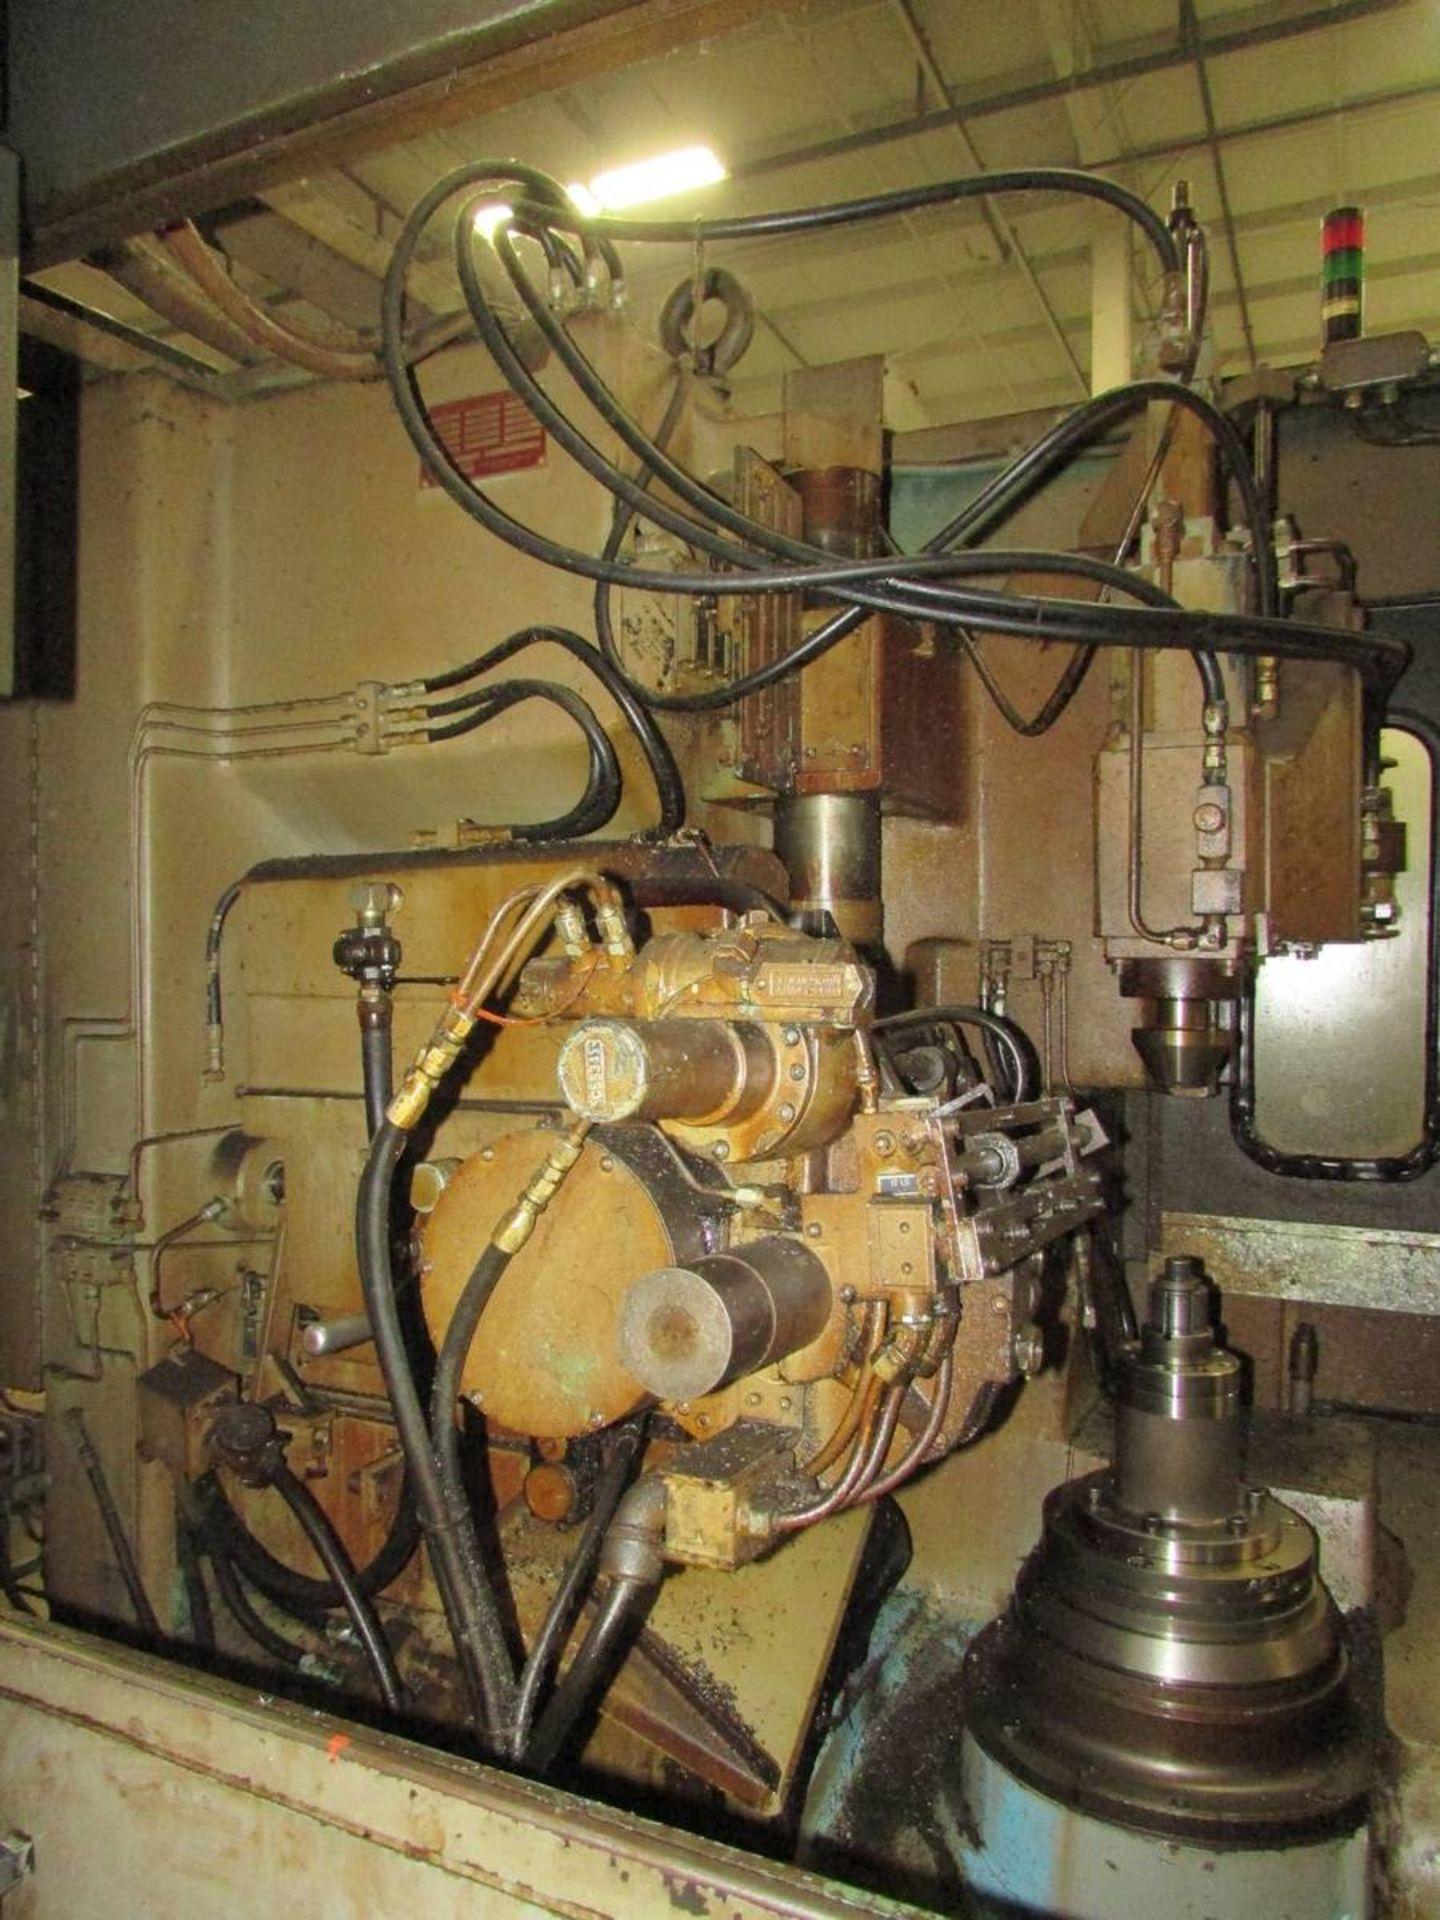 Cleveland/ Waterbury Farrel CR300-612-002 Universal CNC Gear Hobbing Machine - Image 6 of 19